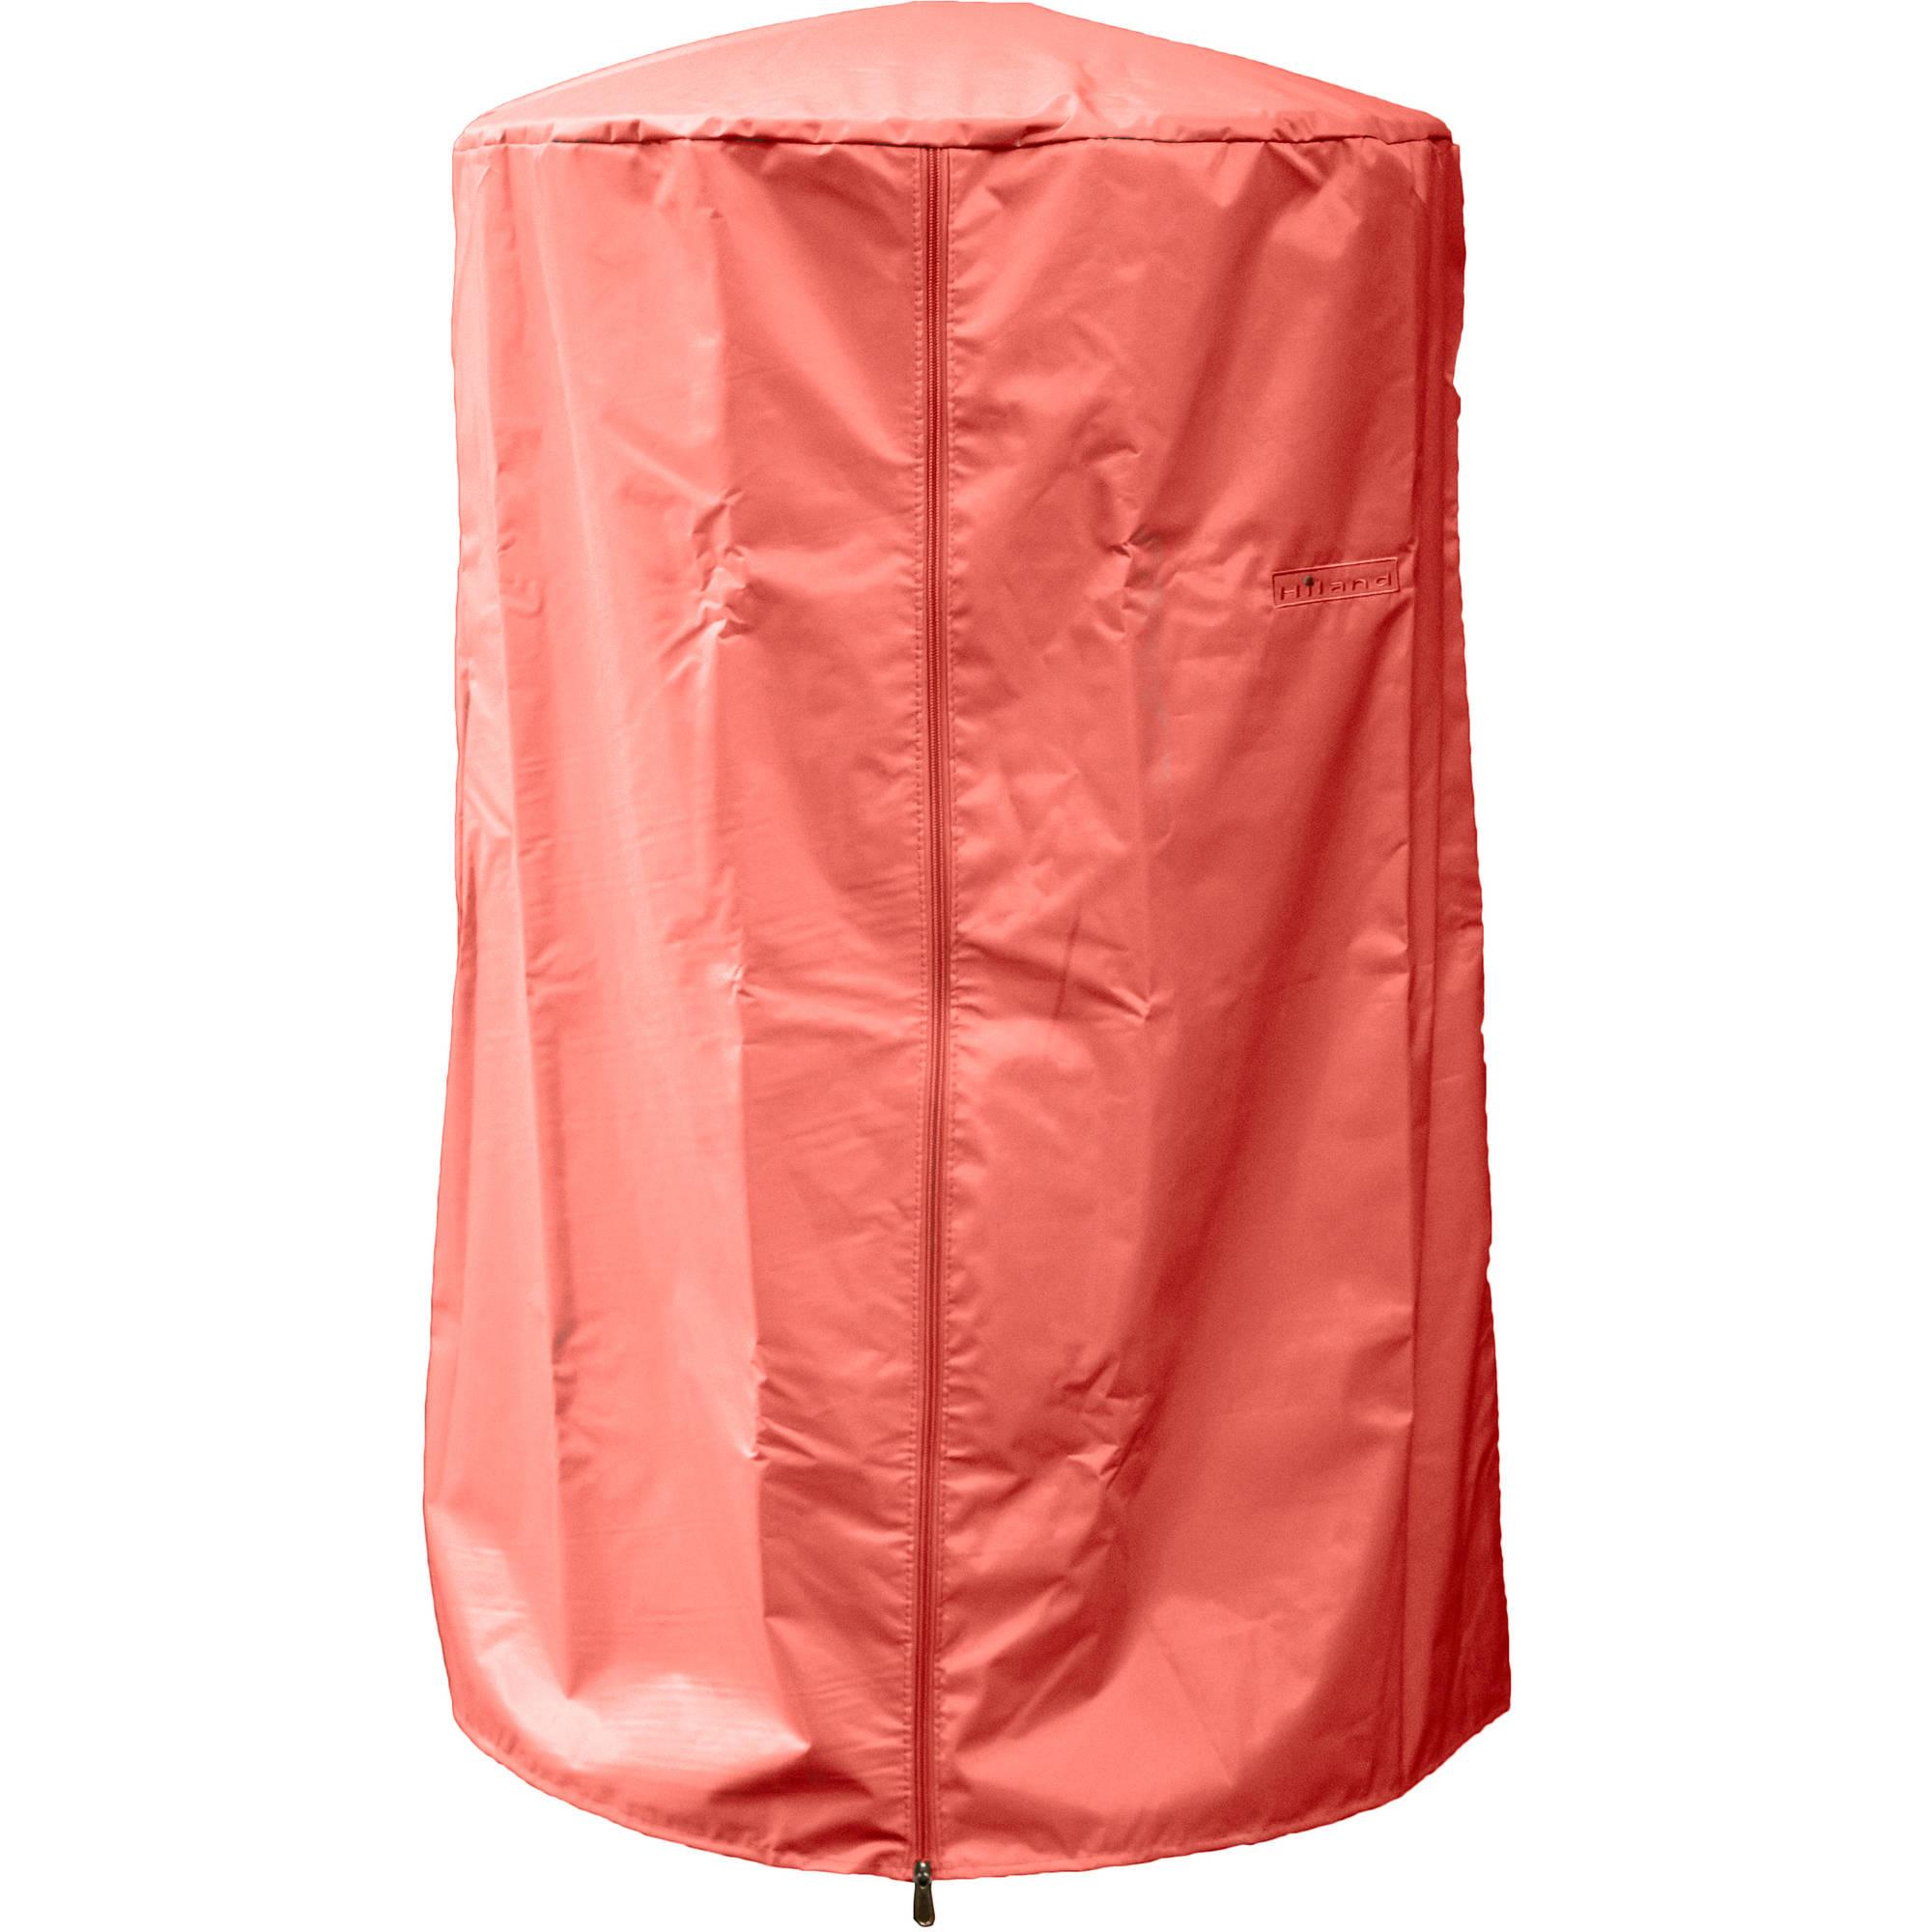 Hiland Heavy-Duty Tabletop Patio Heater Cover, Paprika